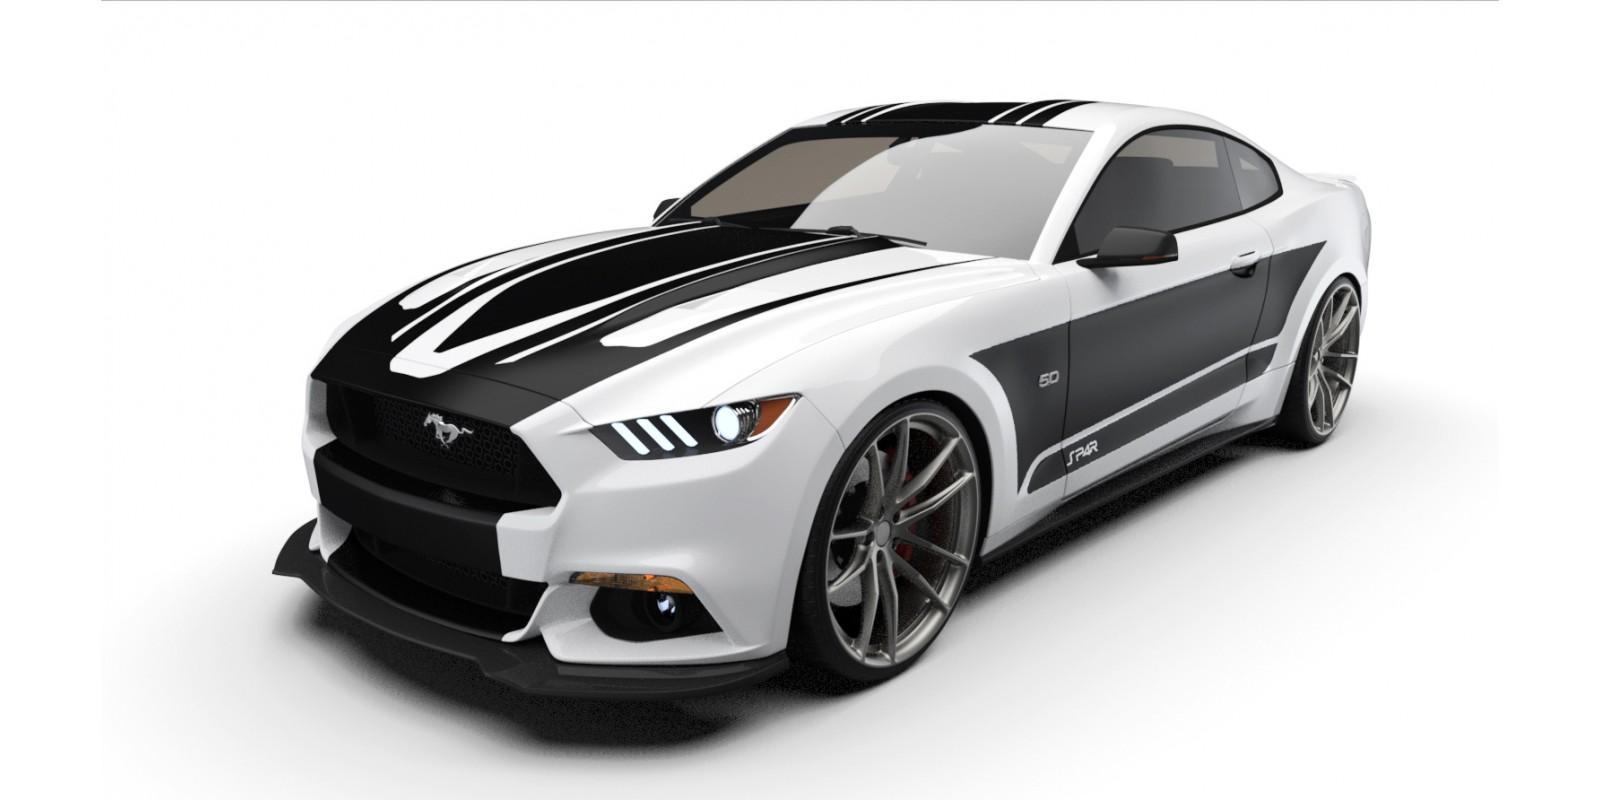 Raceskinz® 2015-2017 Mustang RS50 SP4R™ Edition Premium Graphics Kit